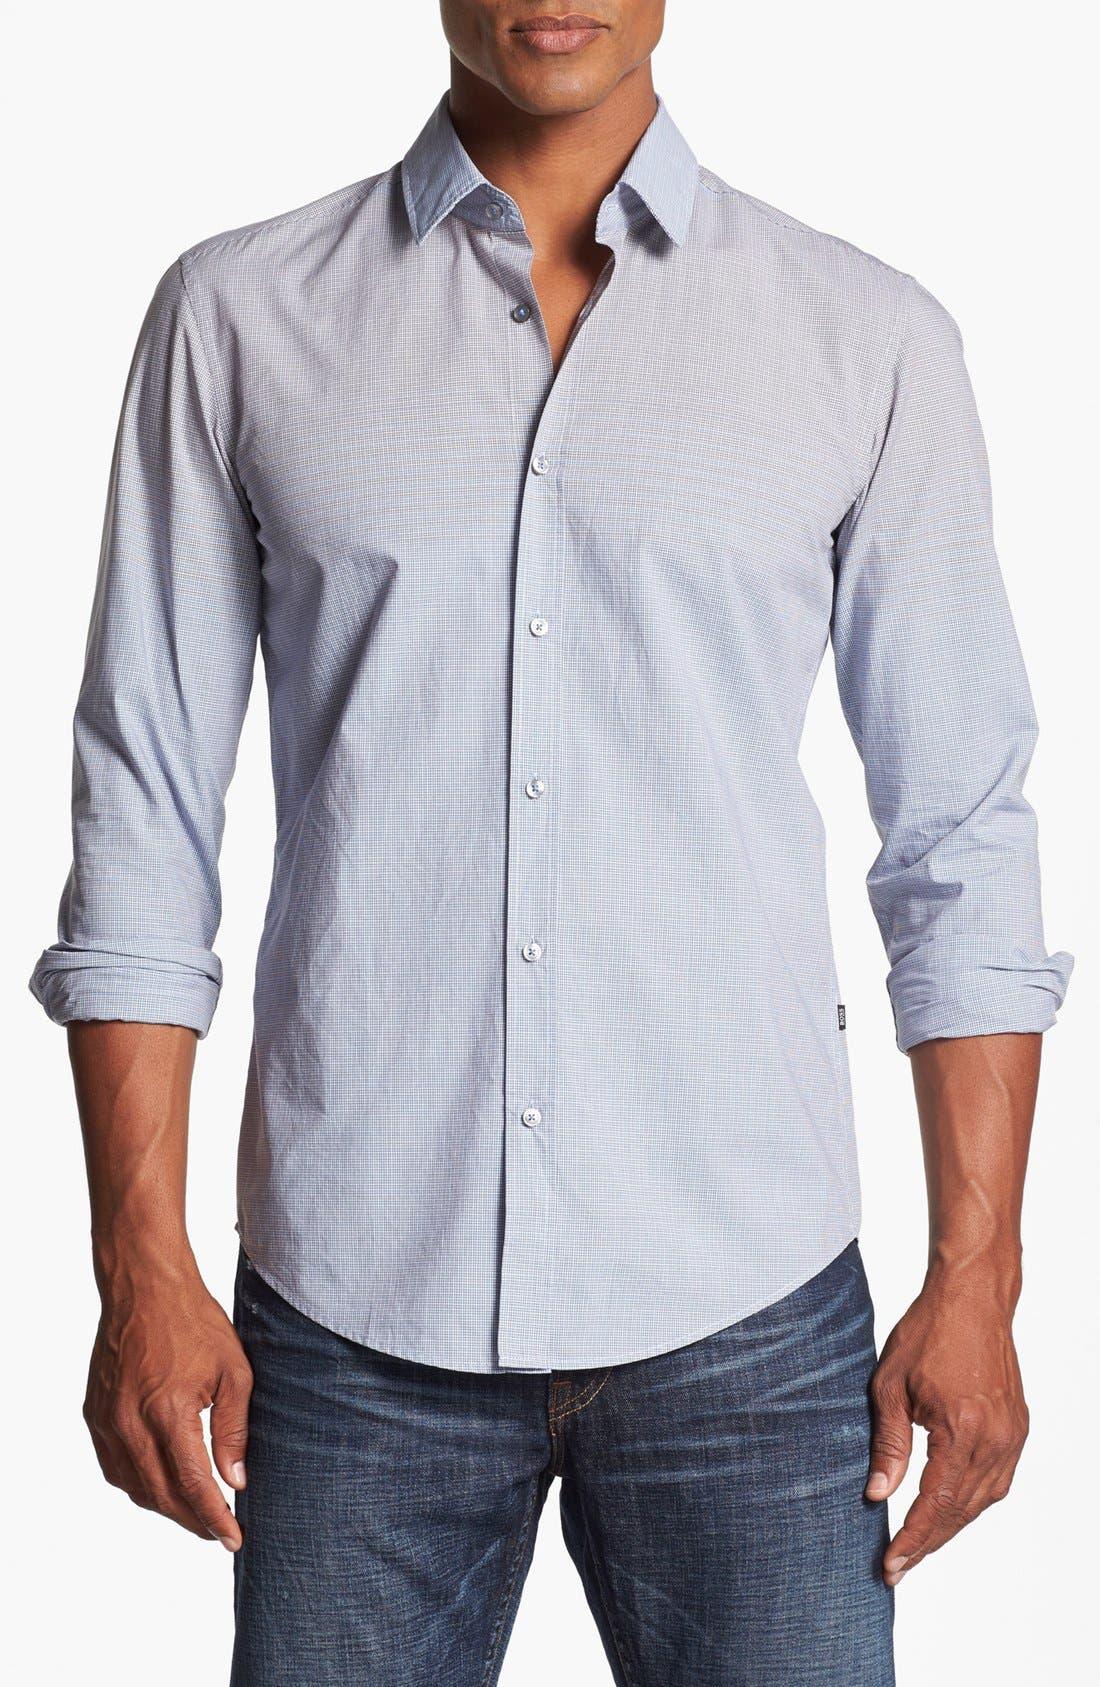 Main Image - BOSS HUGO BOSS 'Ronny' Slim Fit Ombré Check Sport Shirt